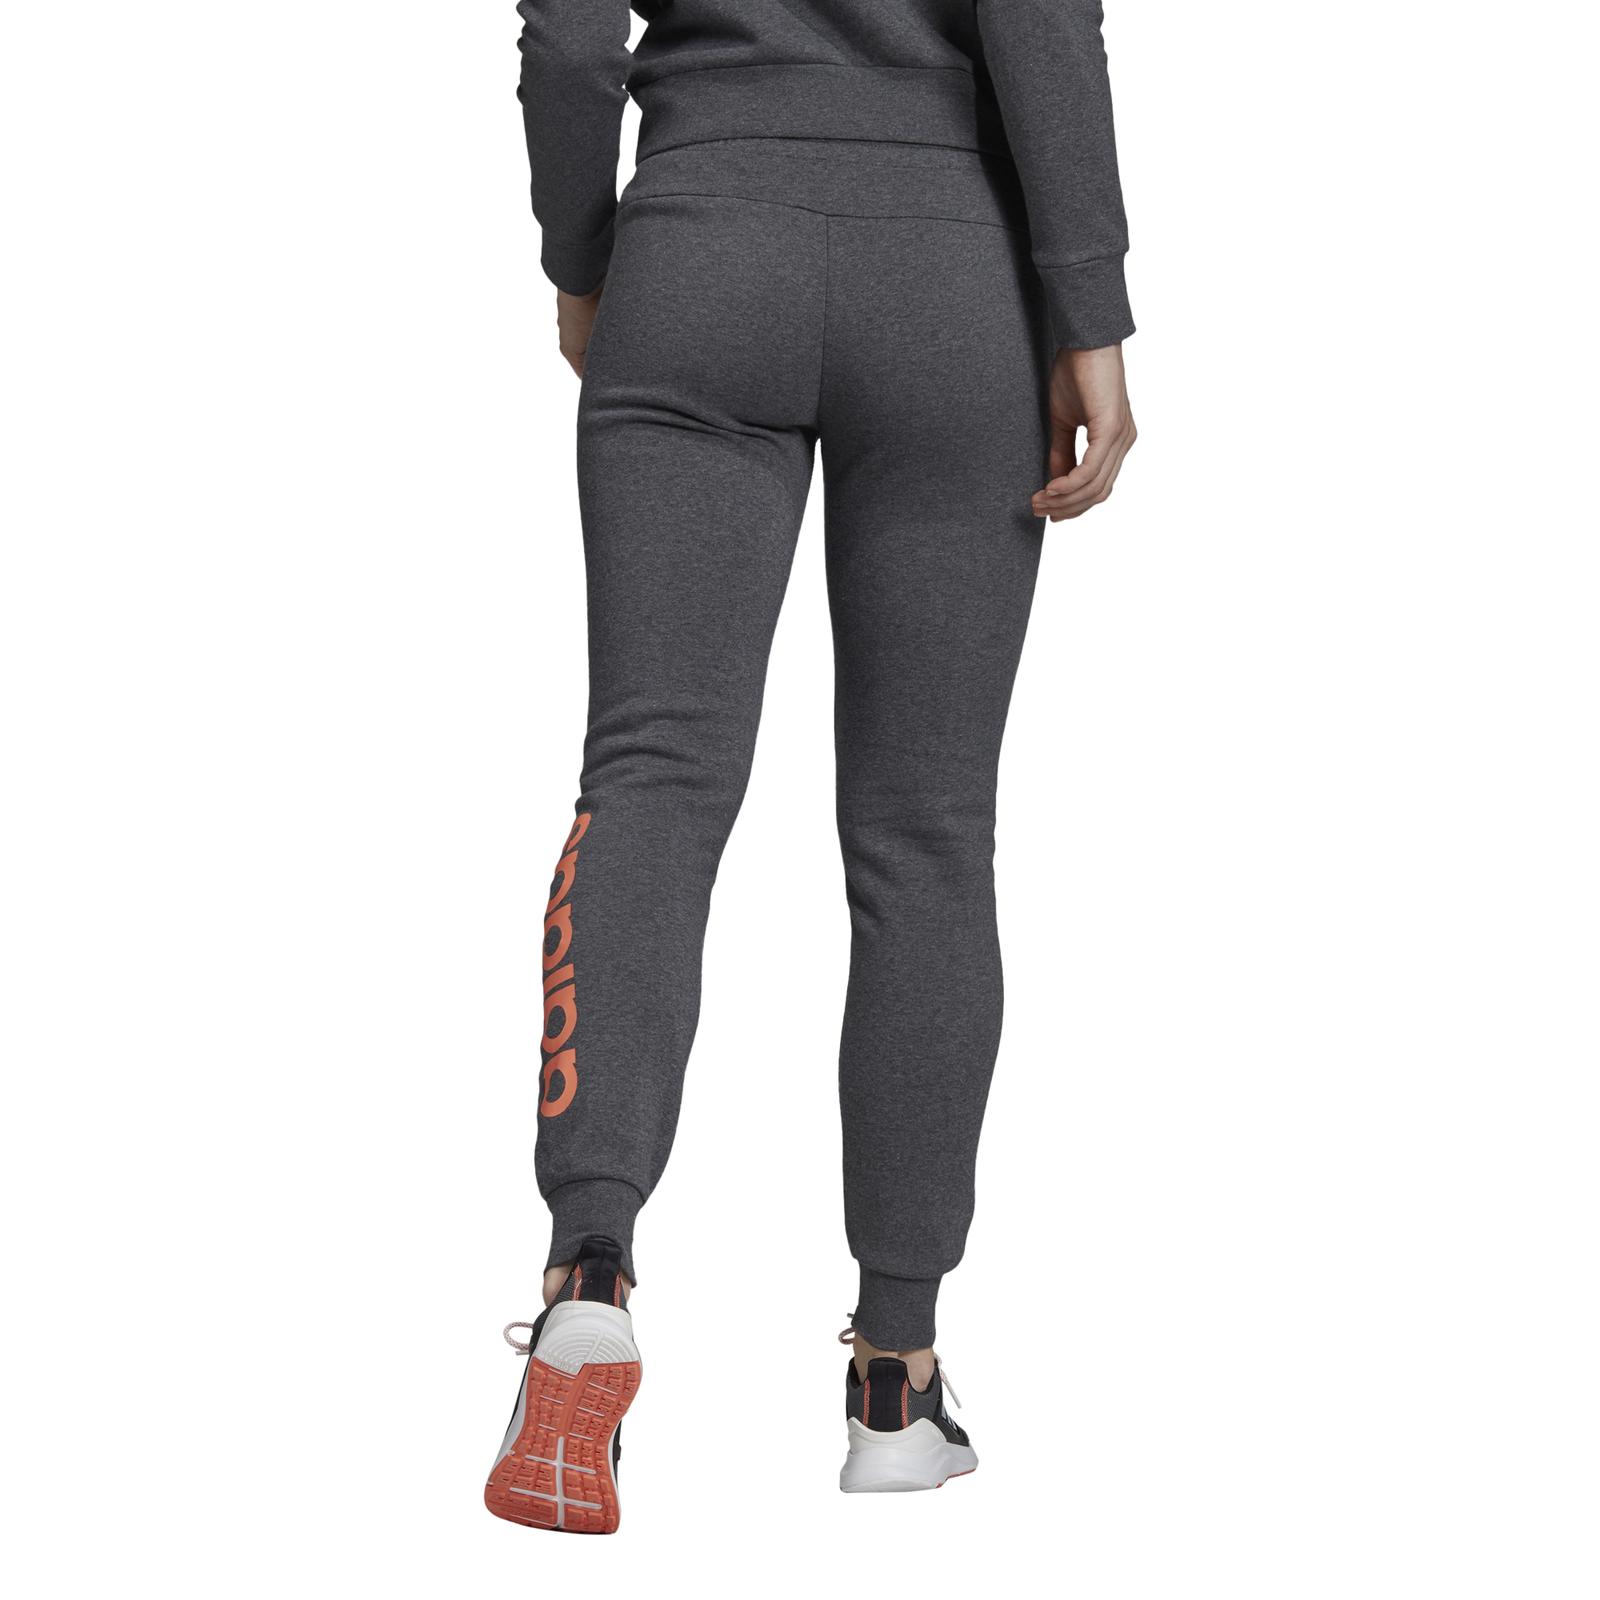 Details about Adidas Core Ladies Fitness Pants Tracksuit Bottoms Essentials Linear Fleece Grey